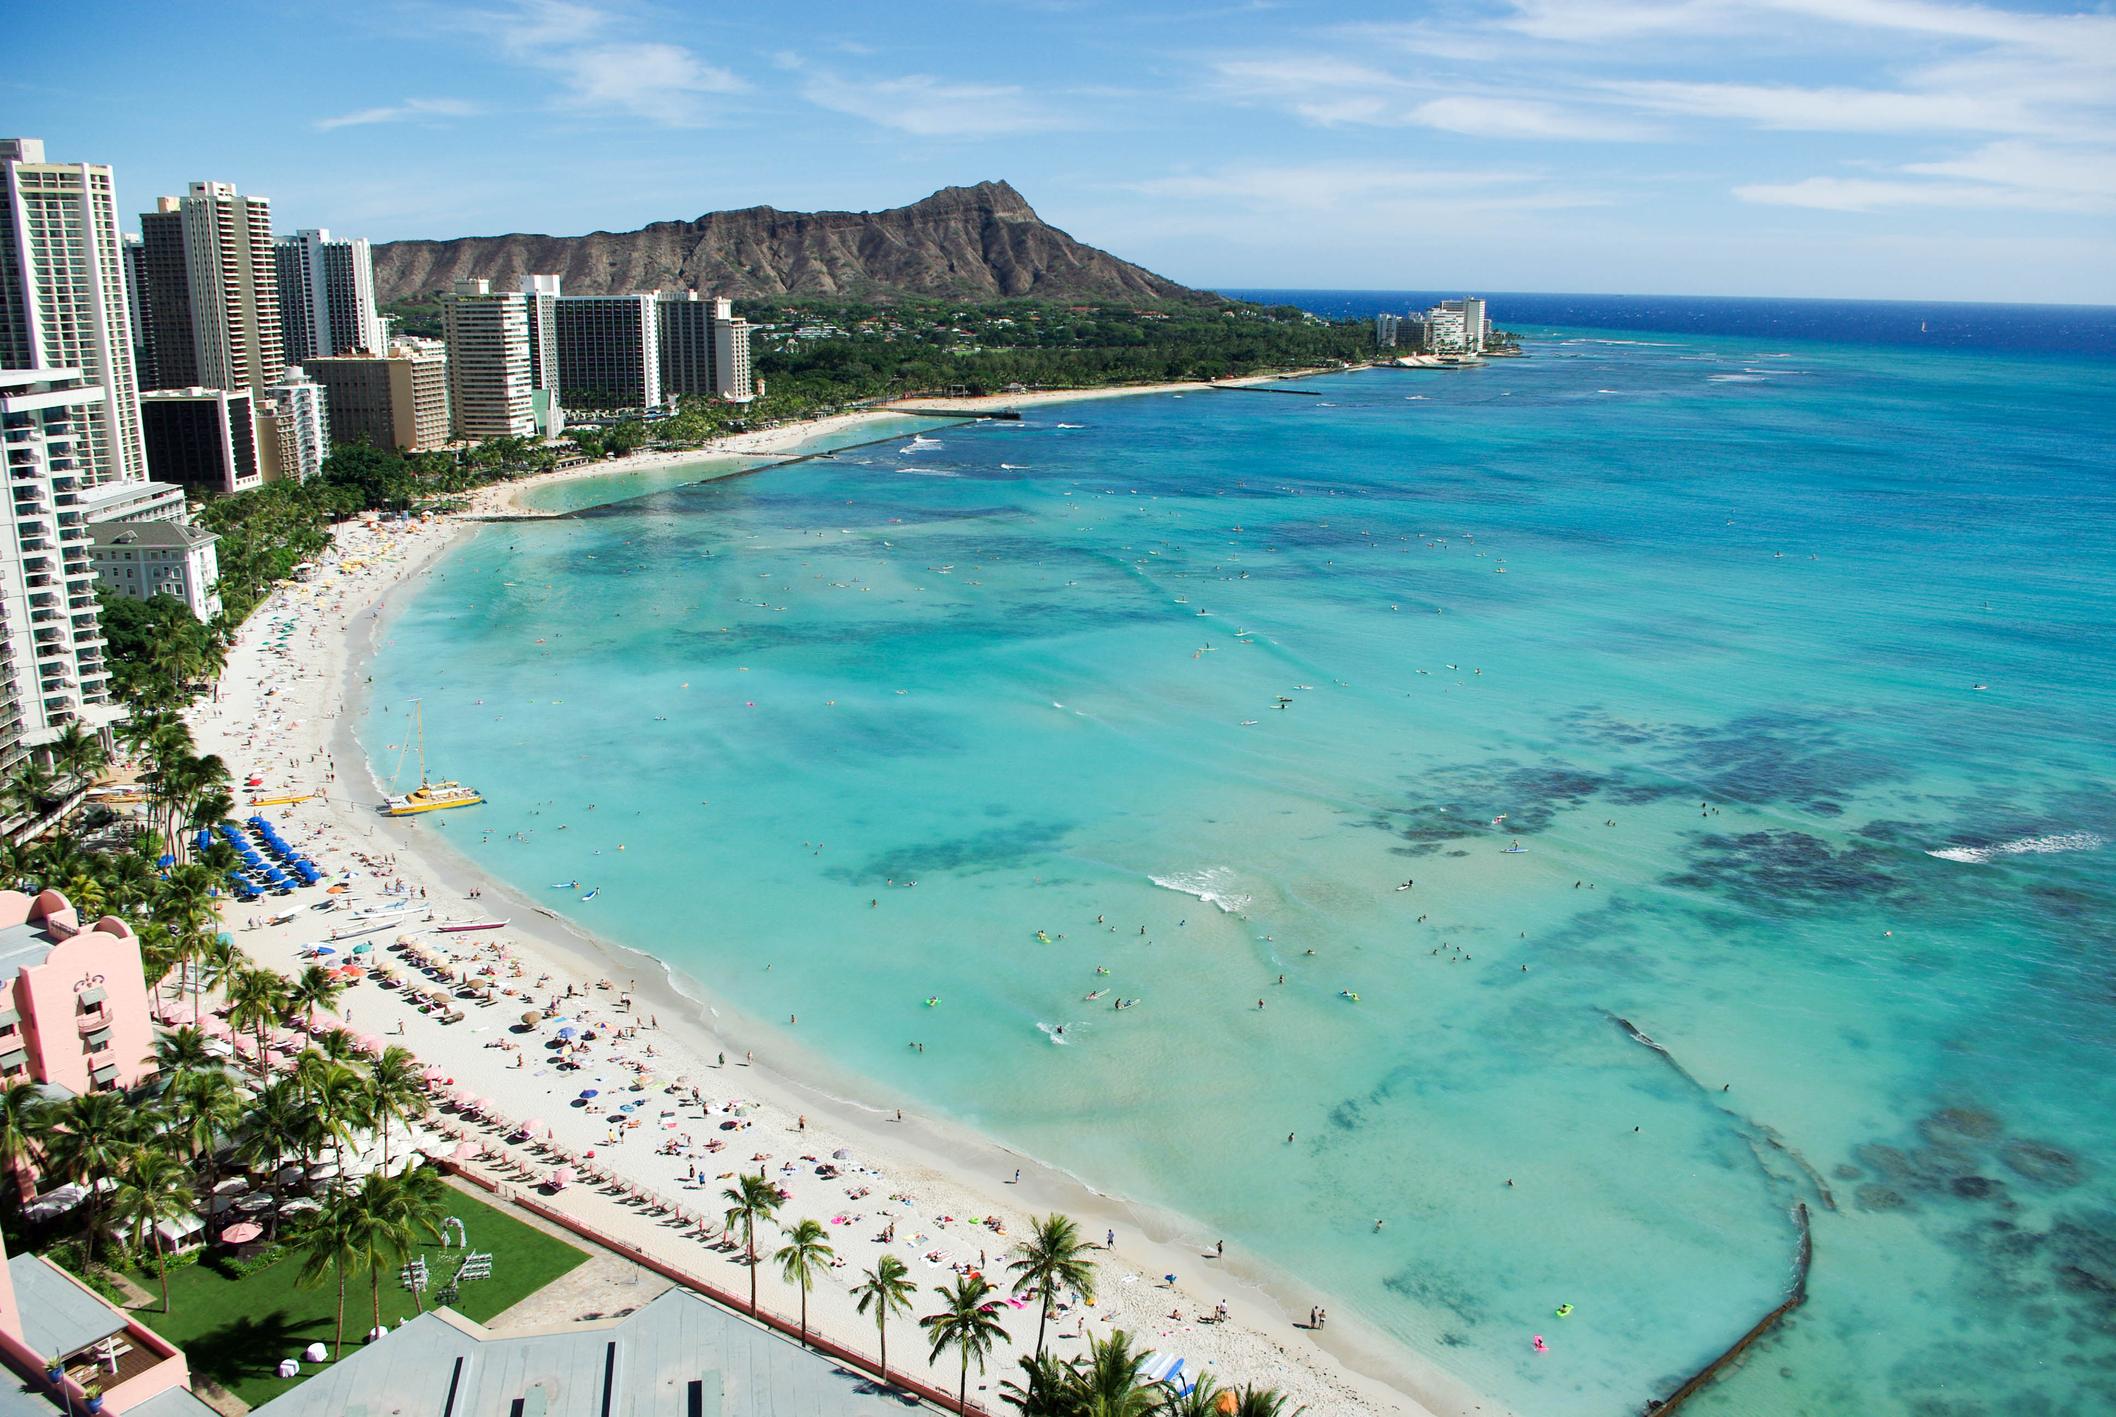 Getty Images - Oahu, Hawaii